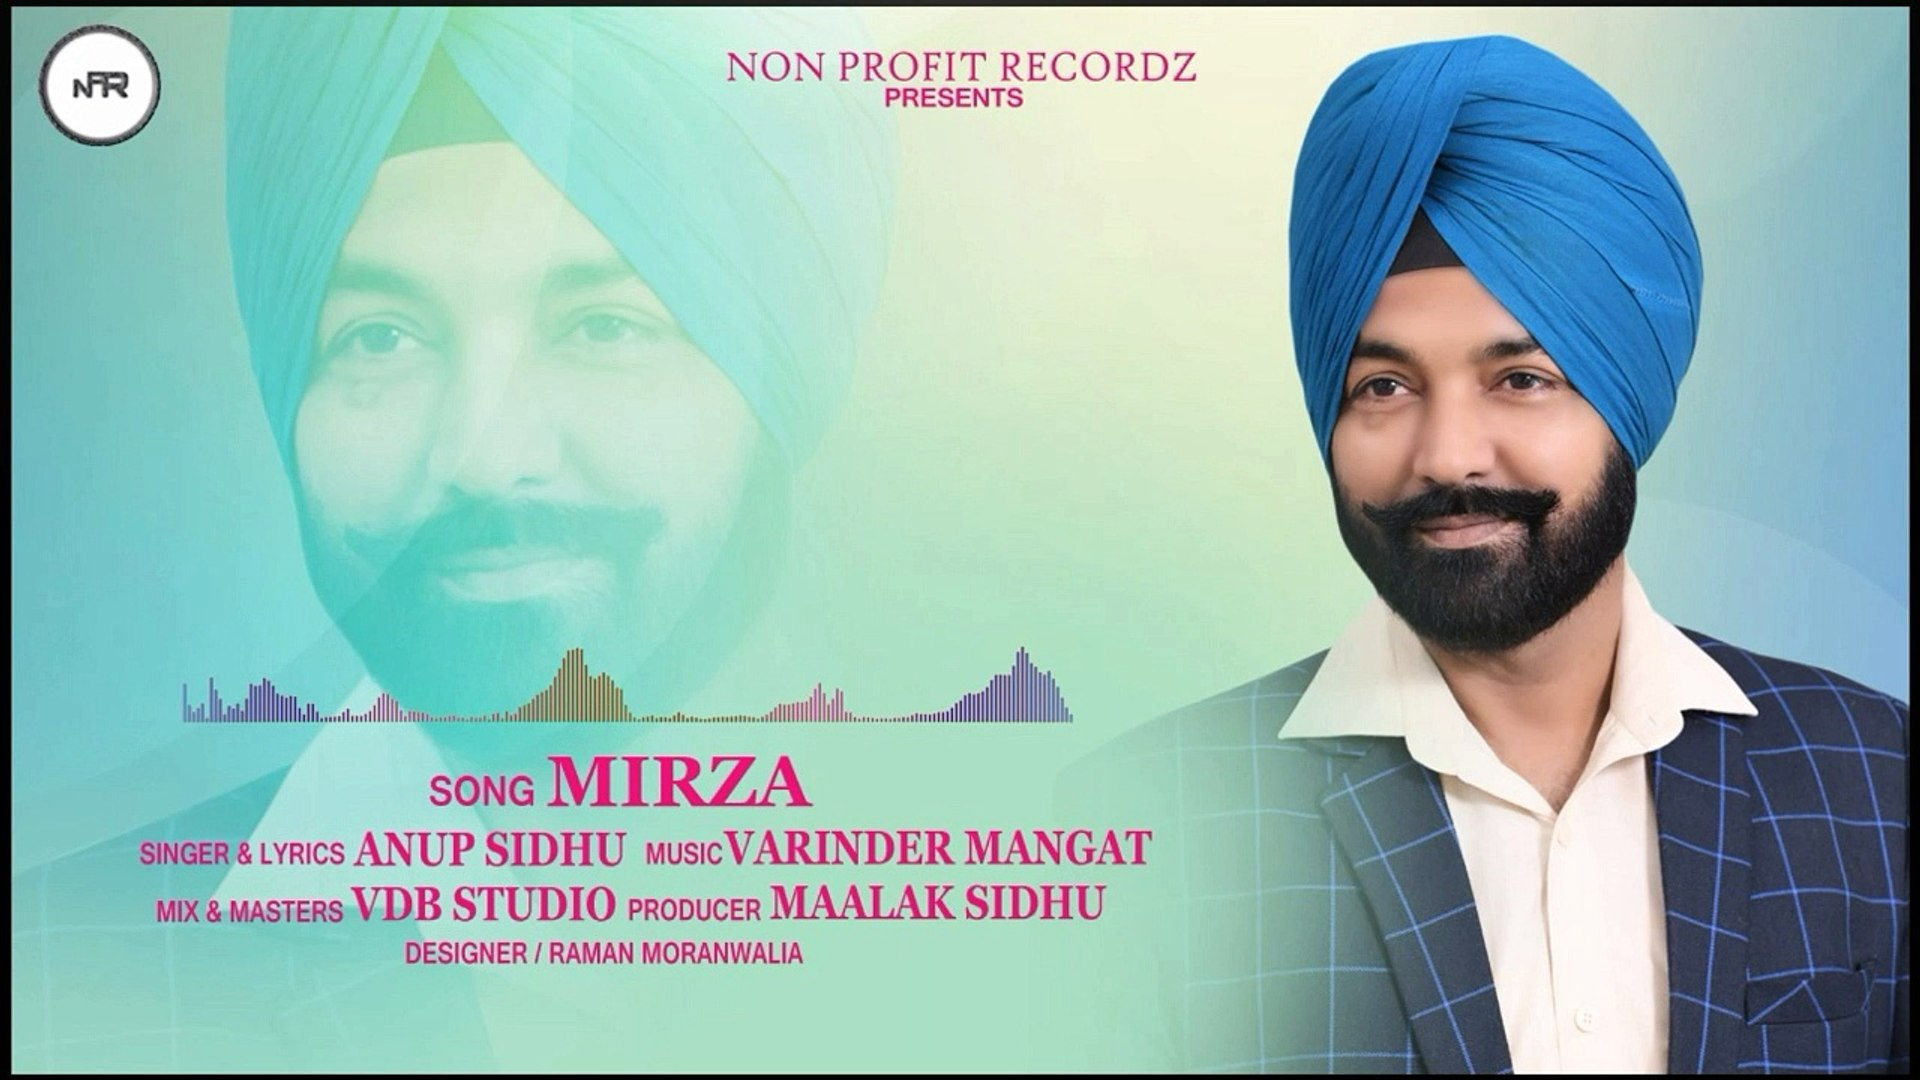 Mirza | Anup Sidhu | Full Audio Song | Non Profit Recordz